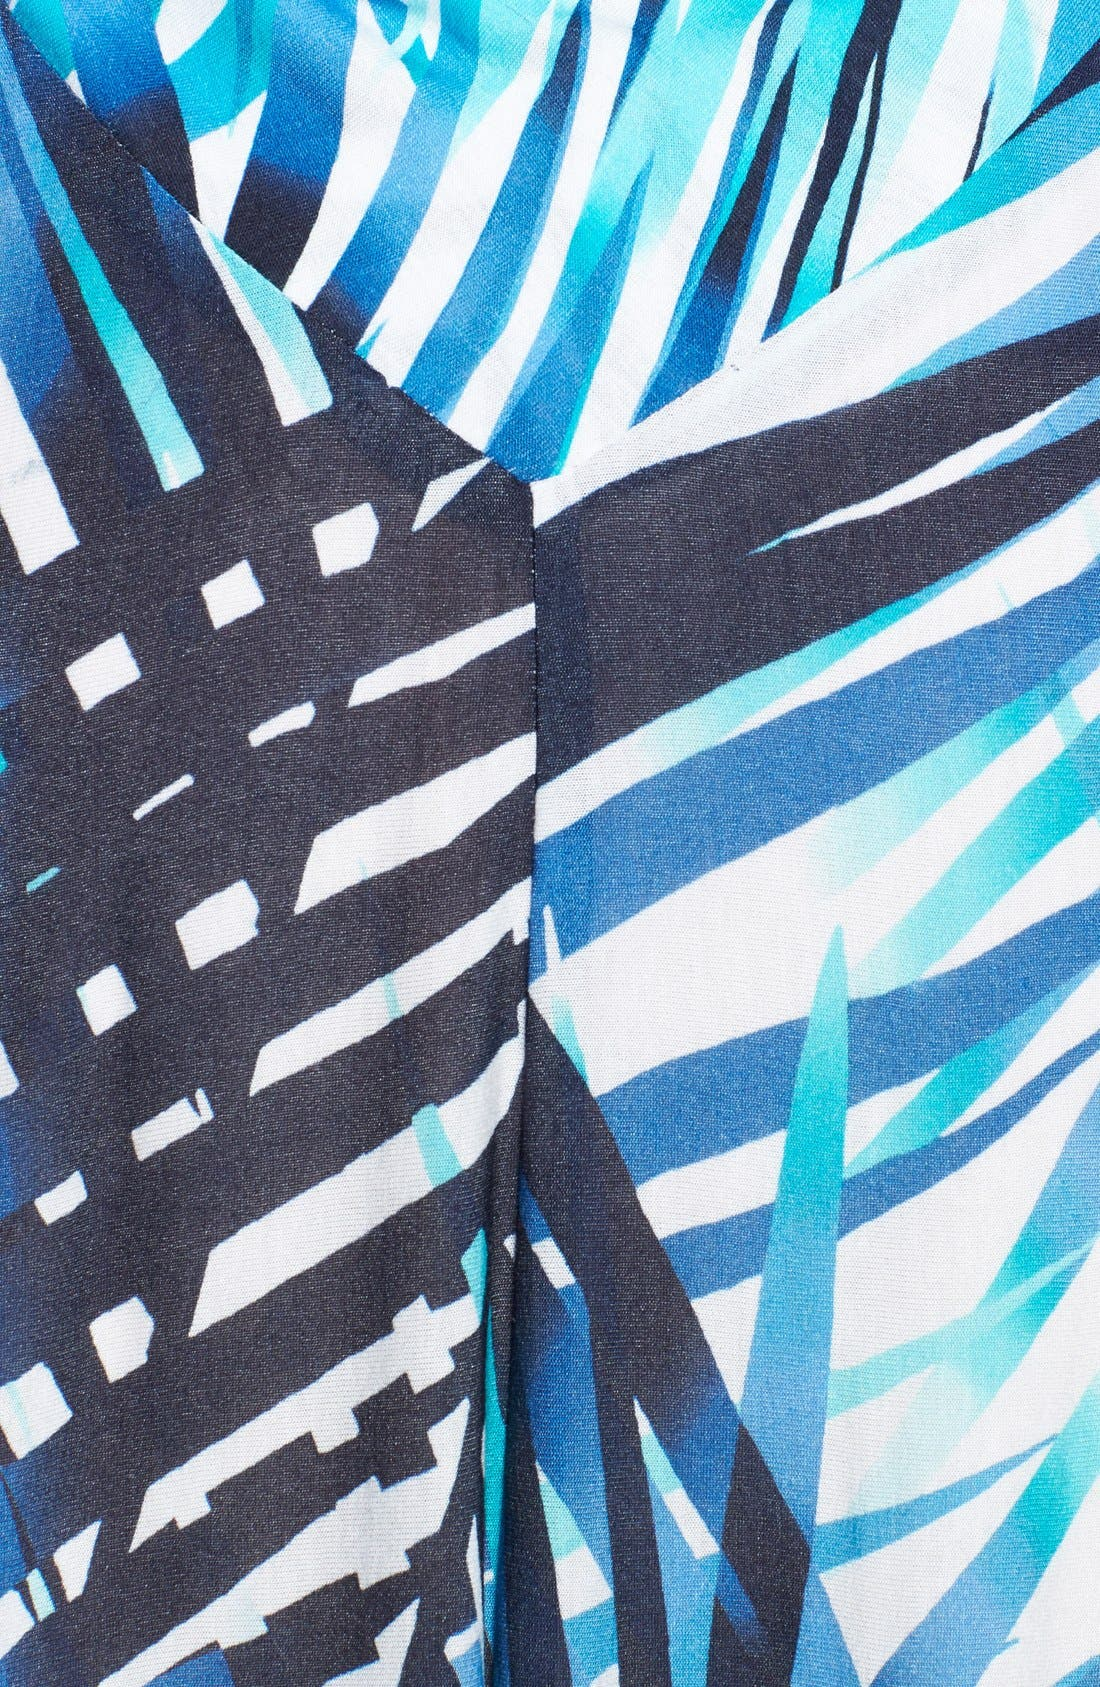 Alternate Image 3  - Trina Turk 'Biscayne' Print Halter Maxi Dress